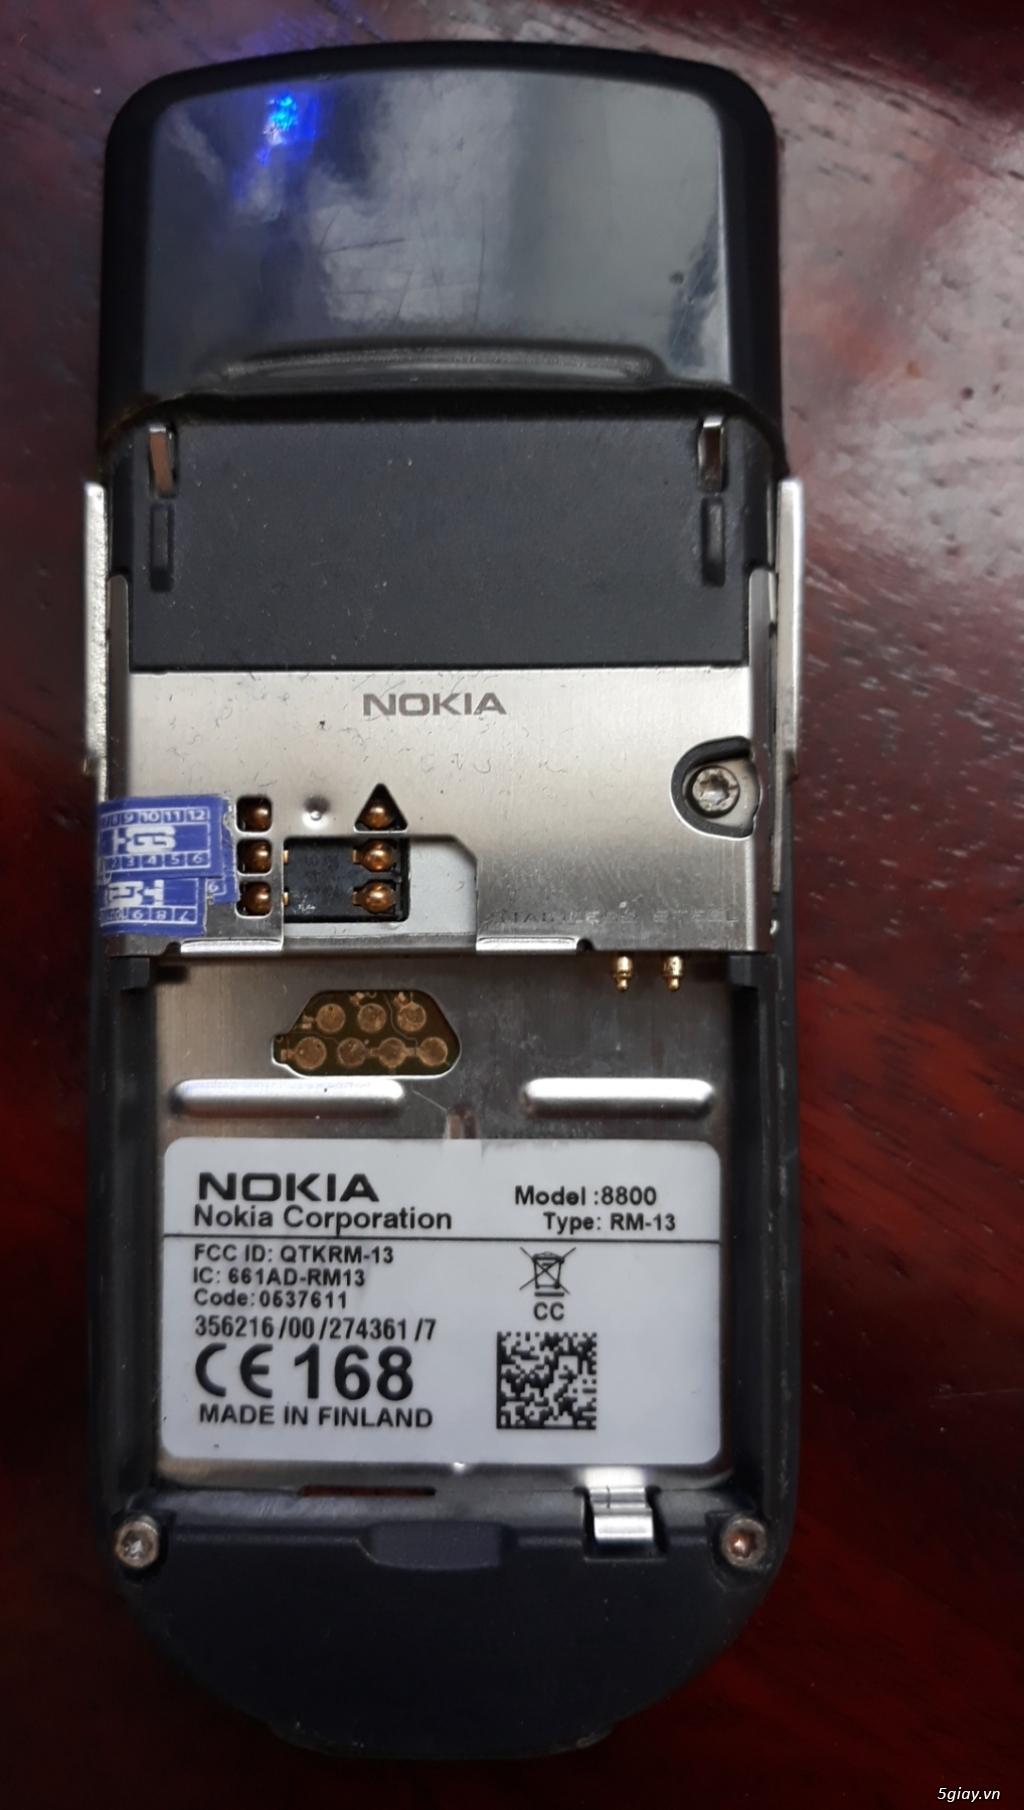 Nokia 8800 Vang danh một thời.